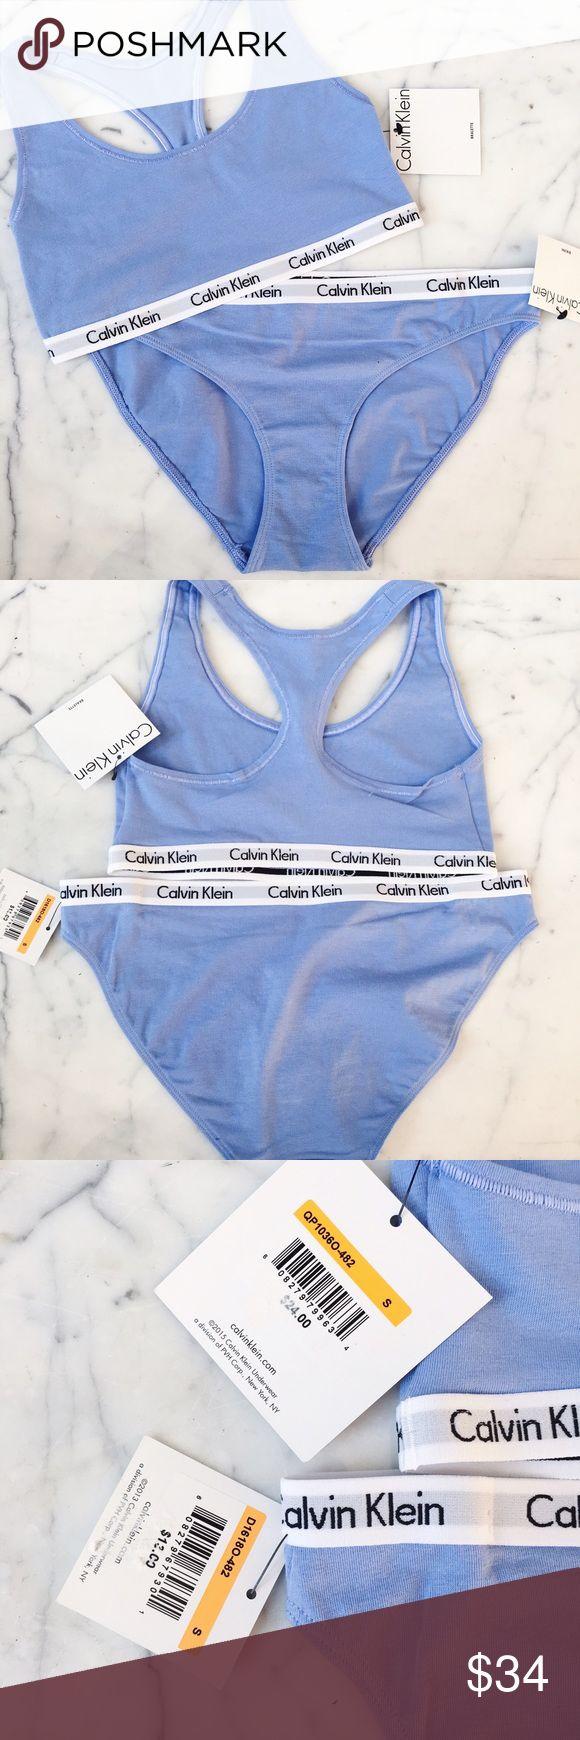 Calvin Klein Underwear Set ️️$28 shipped️️Calvin klein classic banded sports bra and underwear in periwinkle! Size s top and bottom Calvin Klein Intimates & Sleepwear Bras